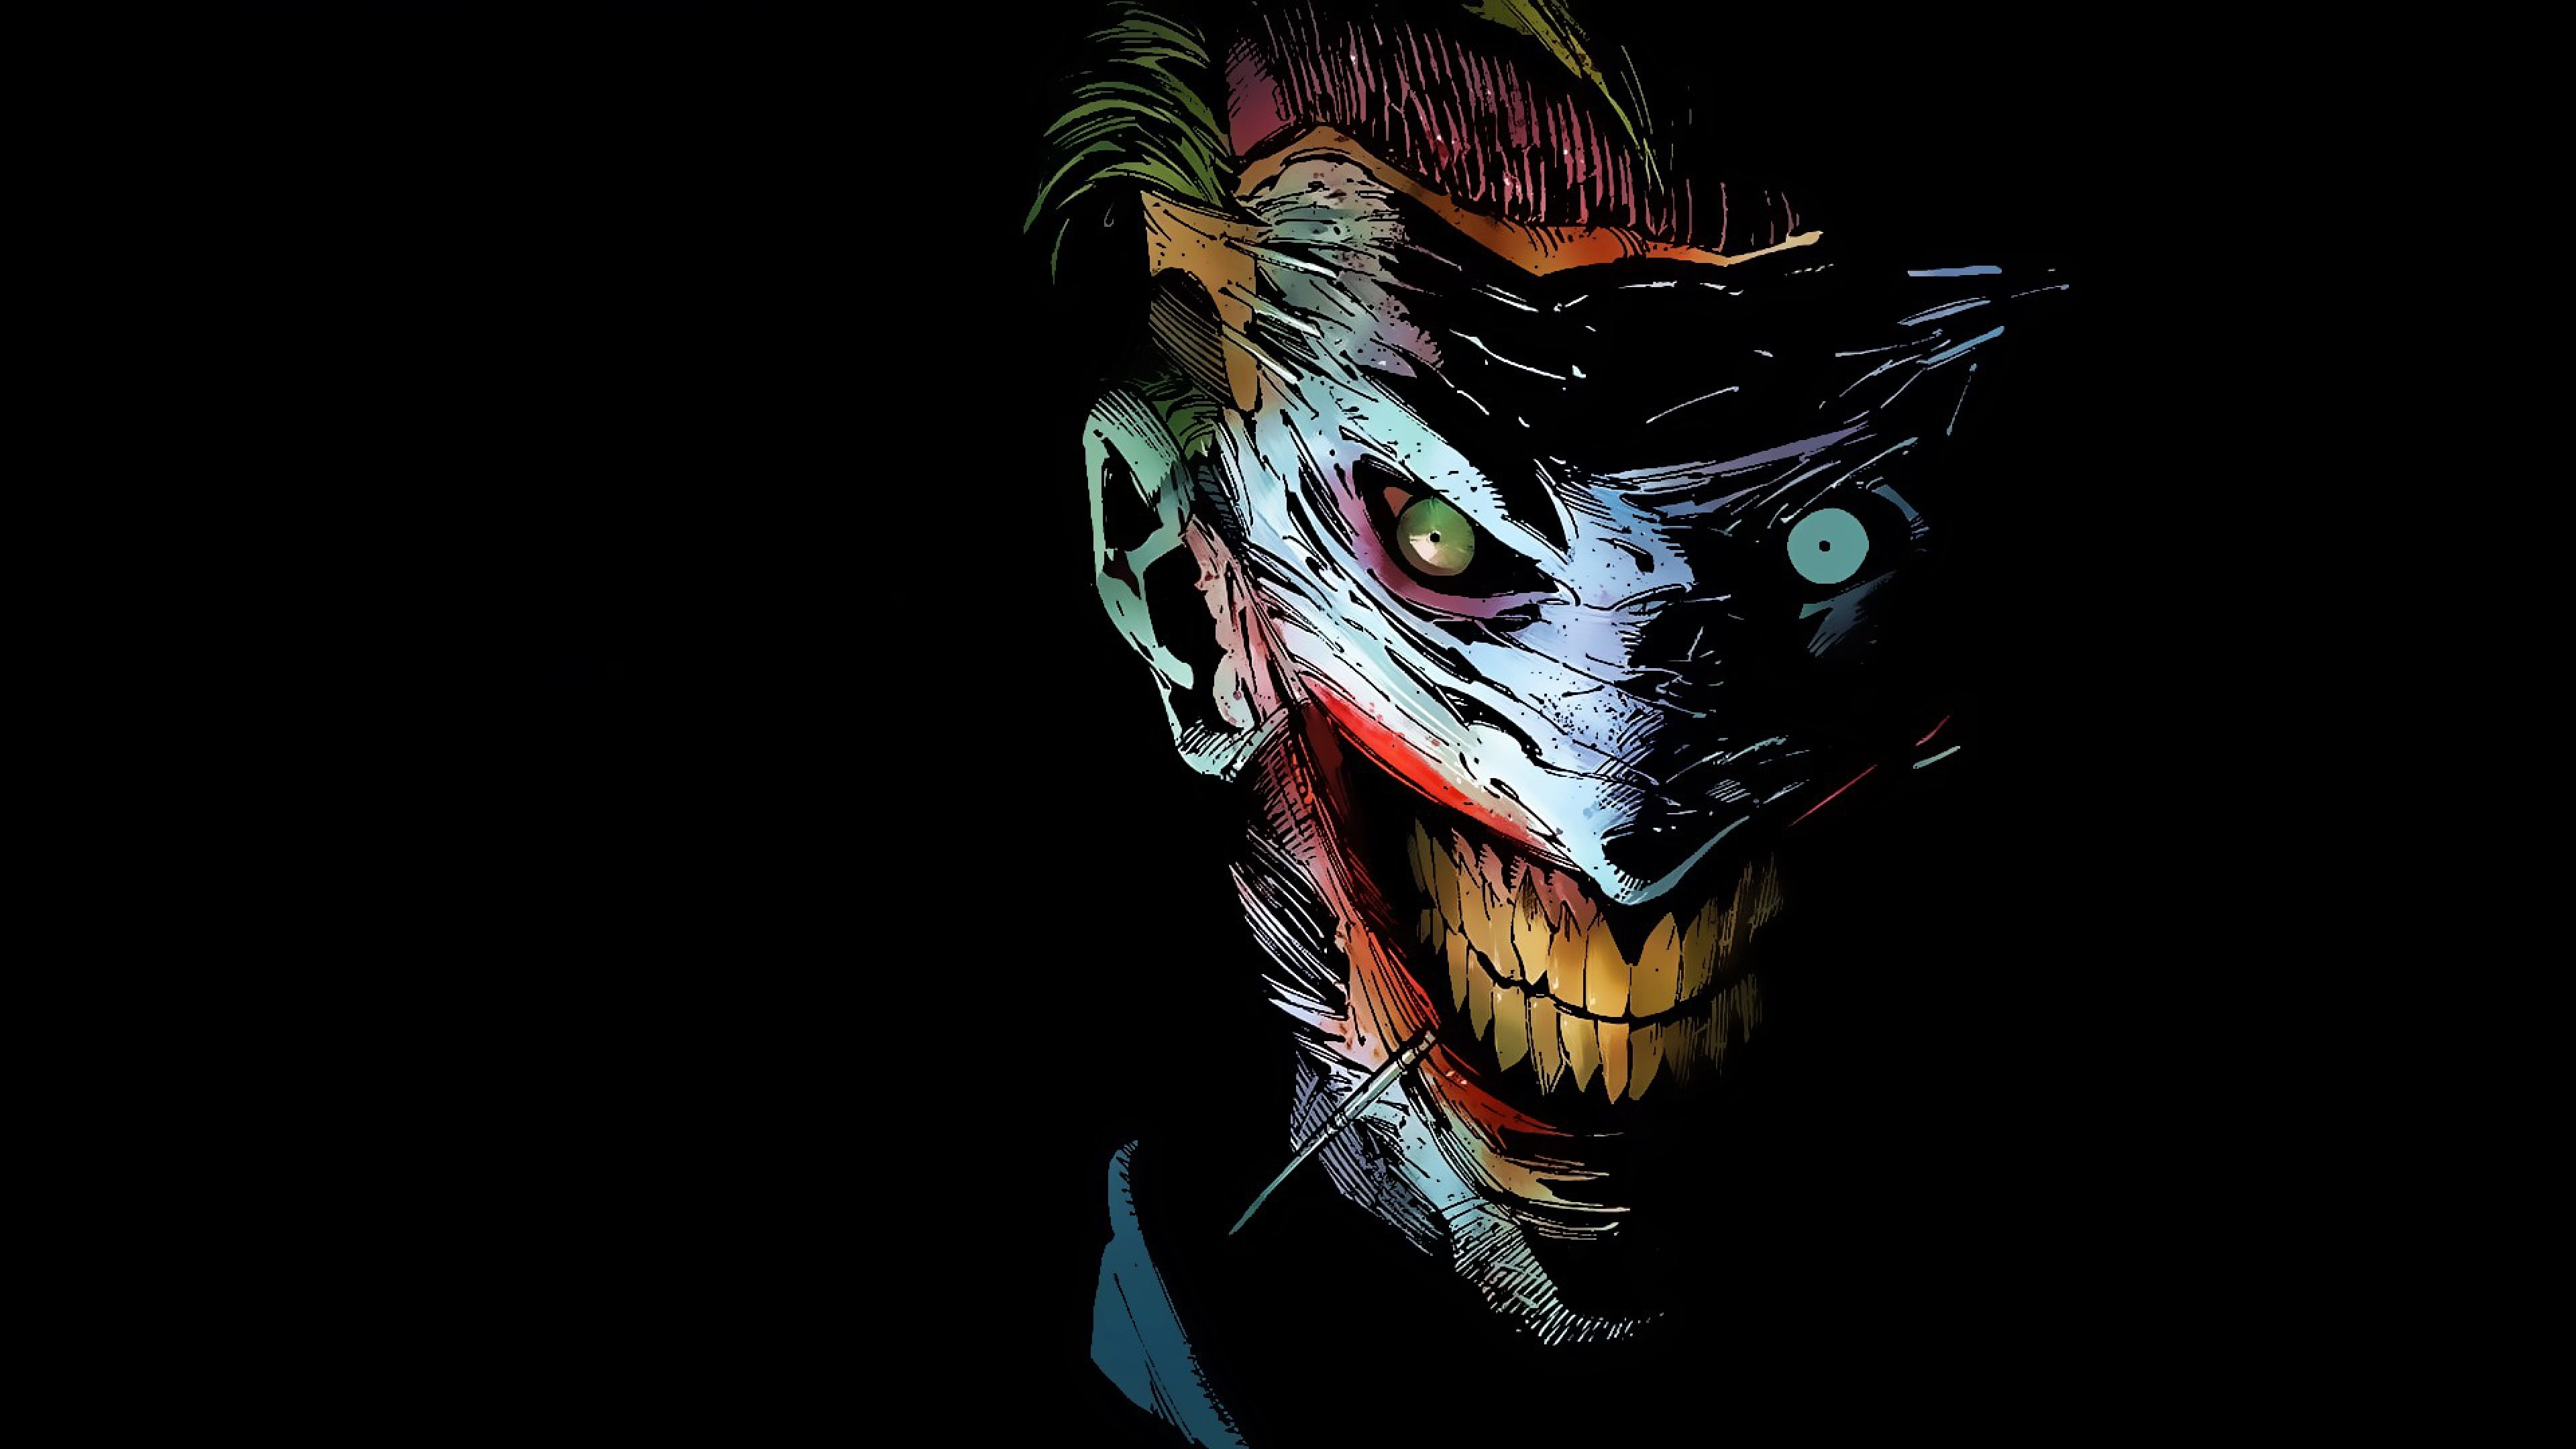 Best Joker Wallpapers | HD Wallpapers | Pinterest | Joker pictures,  Wallpaper and Devil